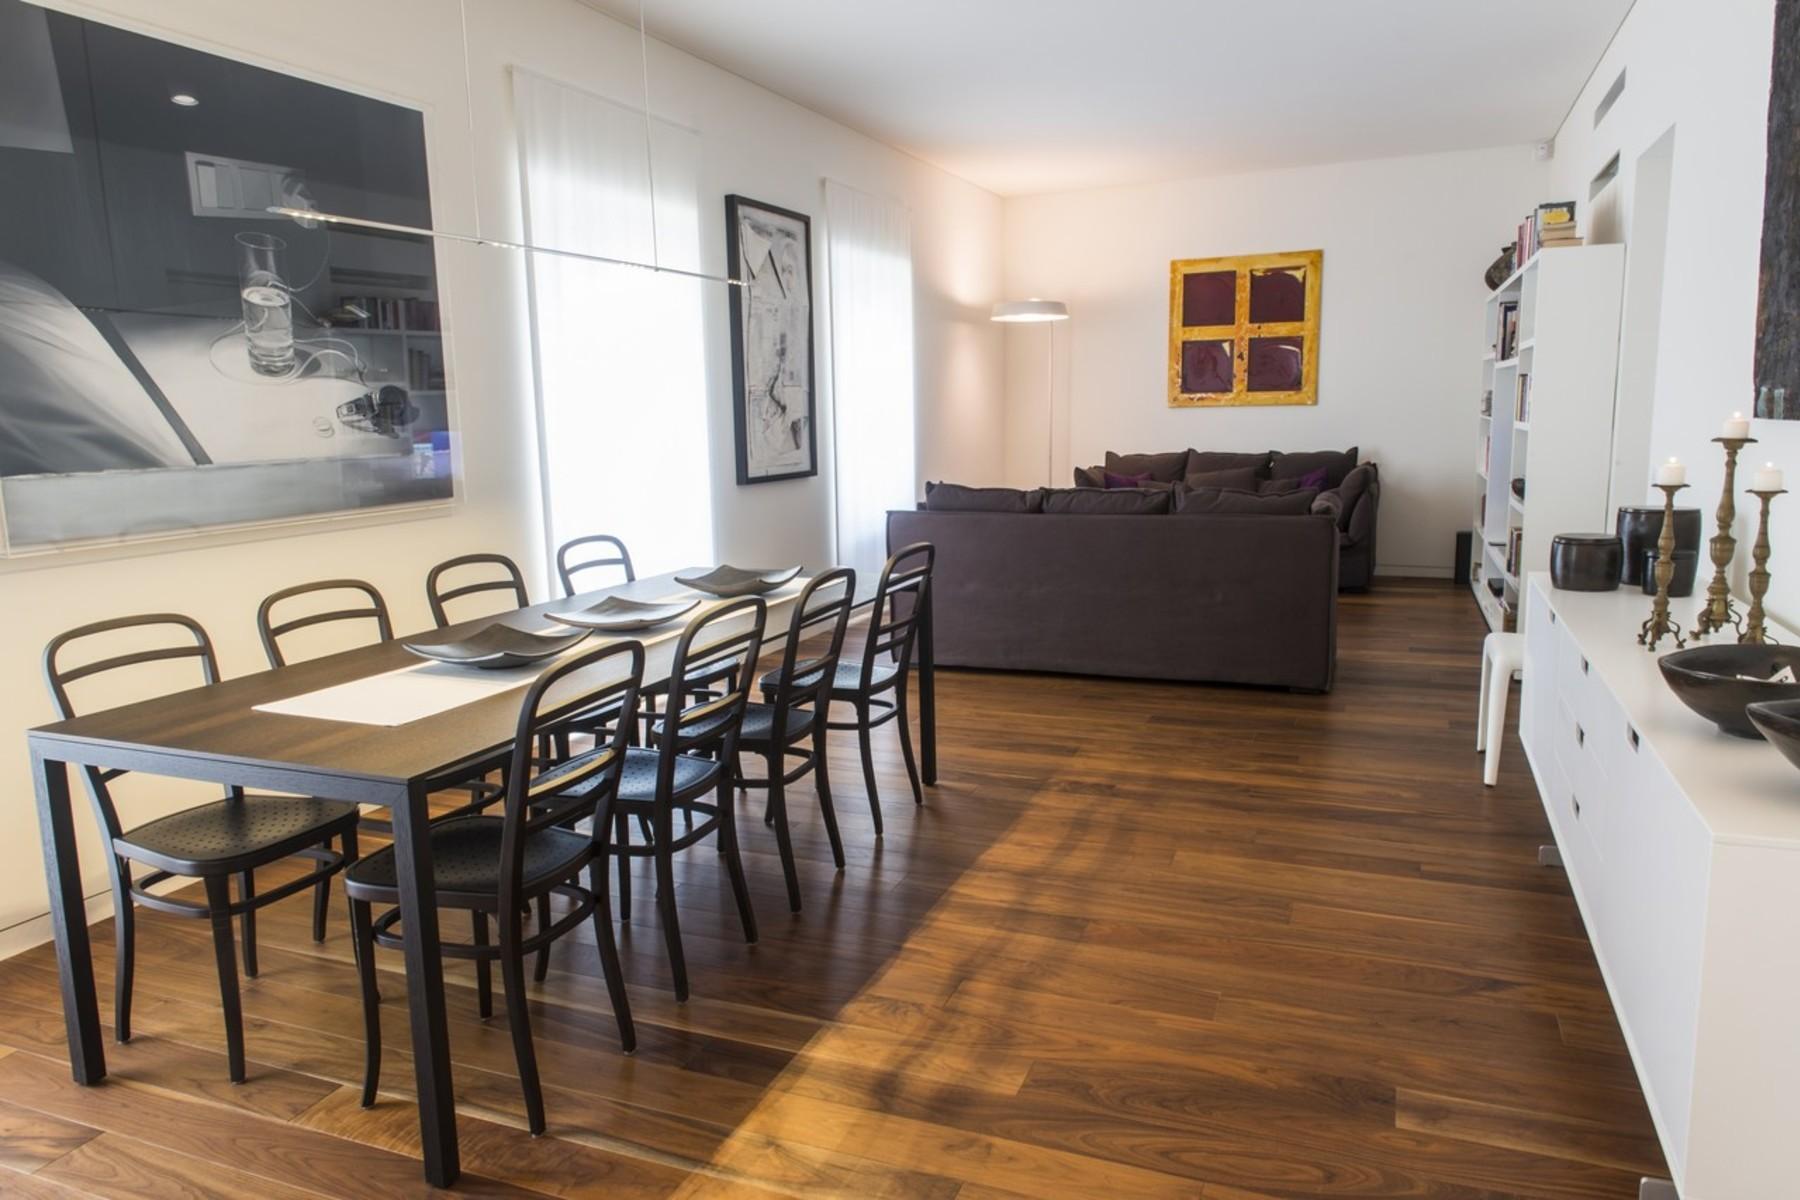 شقة للـ Sale في Prestigious apartment in the pedestrian area in Lugano city centre Lugano, Ticino, 6900 Switzerland